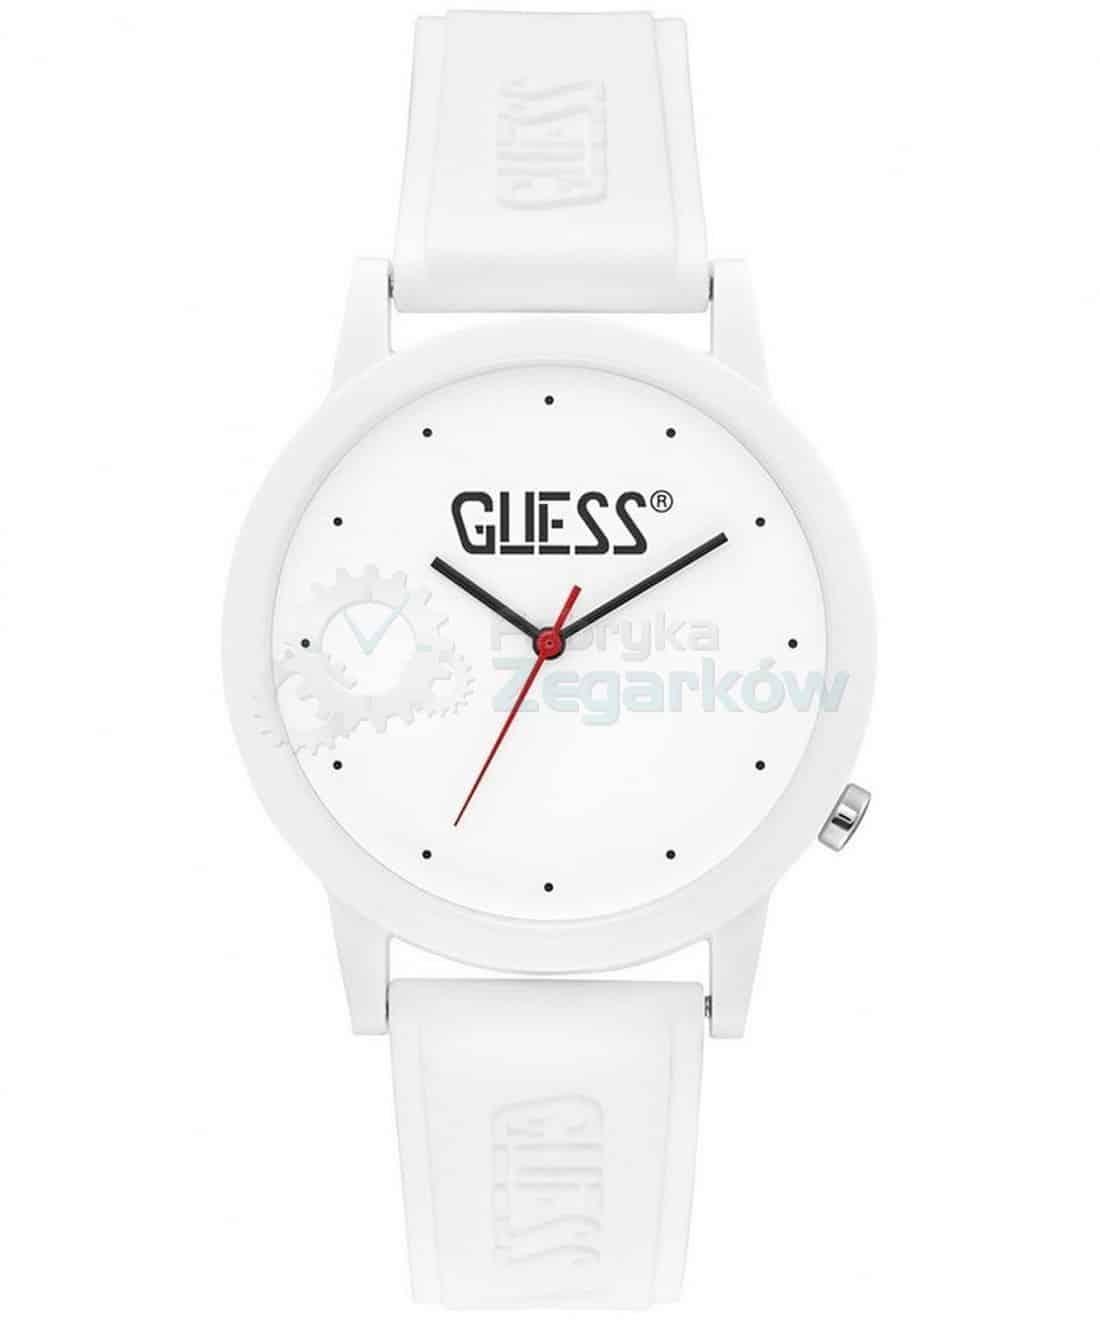 zegarek-damski-guess-originals-v1040m1